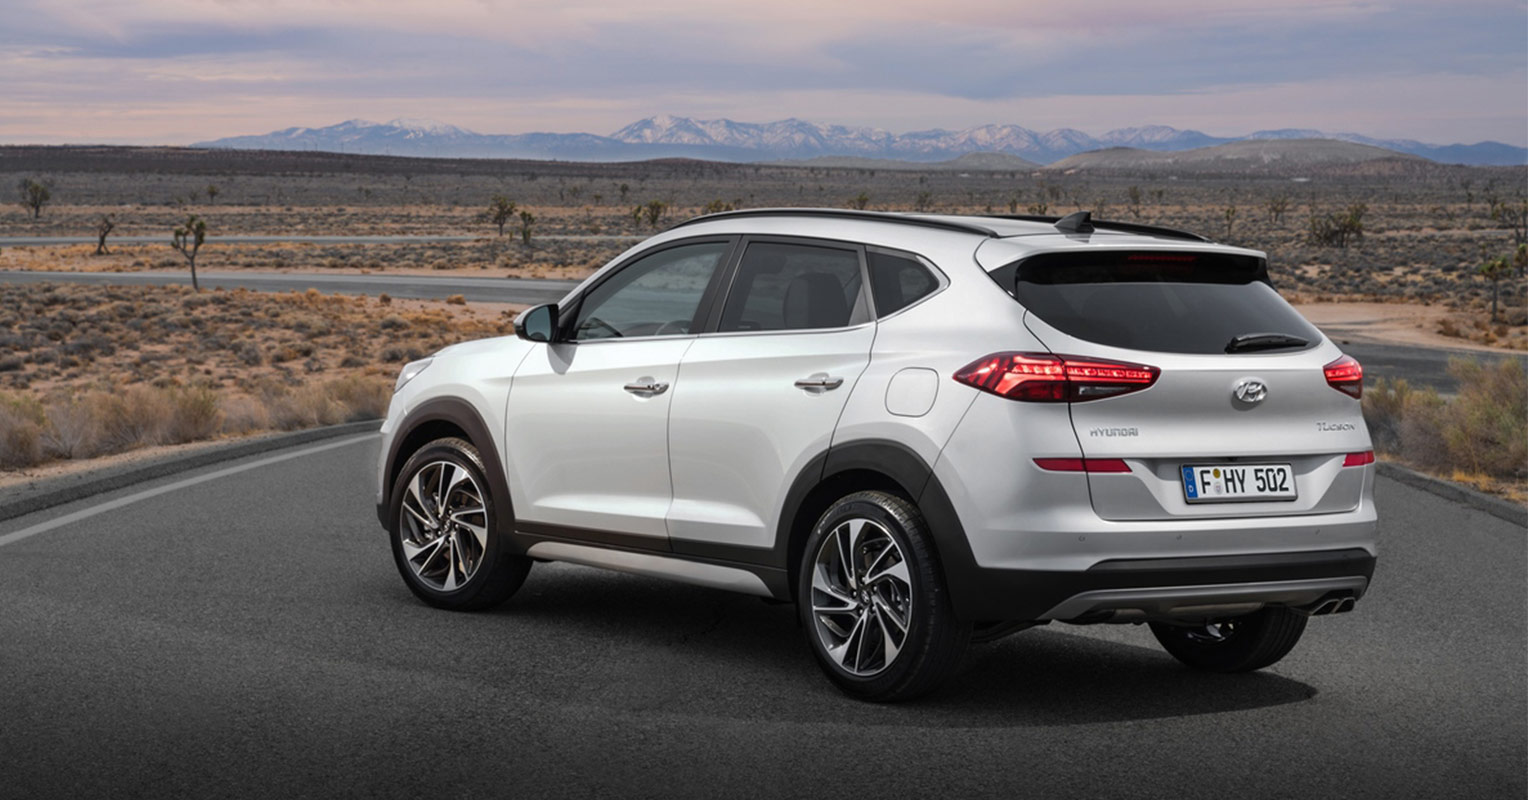 Trasera del Hyundai Tucson 2019